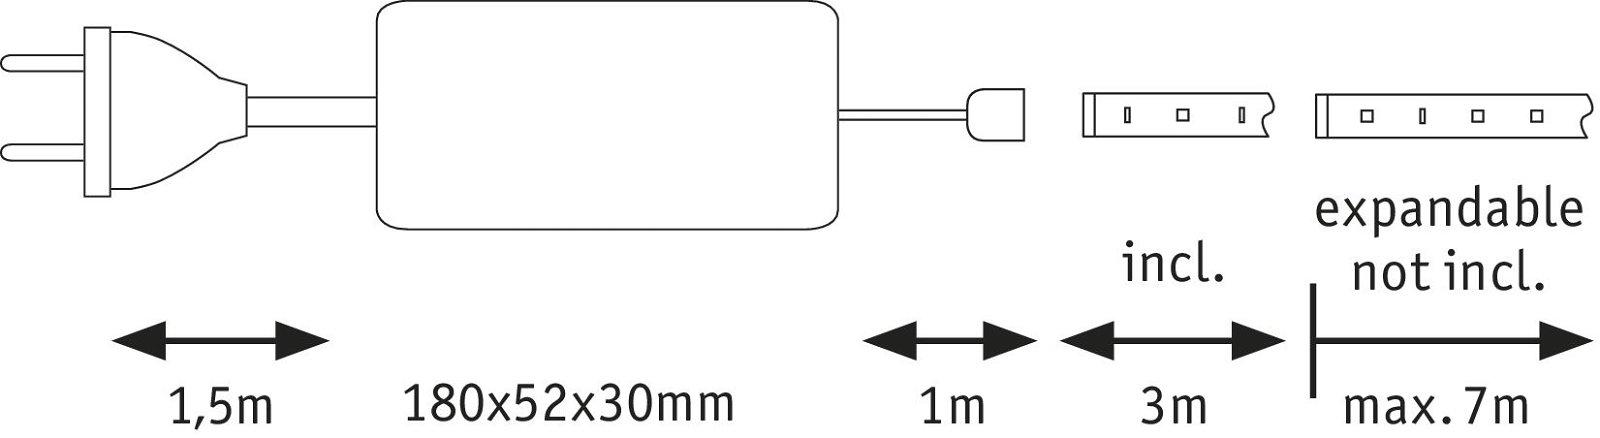 MaxLED 1000 LED Strip Warm wit 3m gecoat 35W 3300lm 2700K 40VA